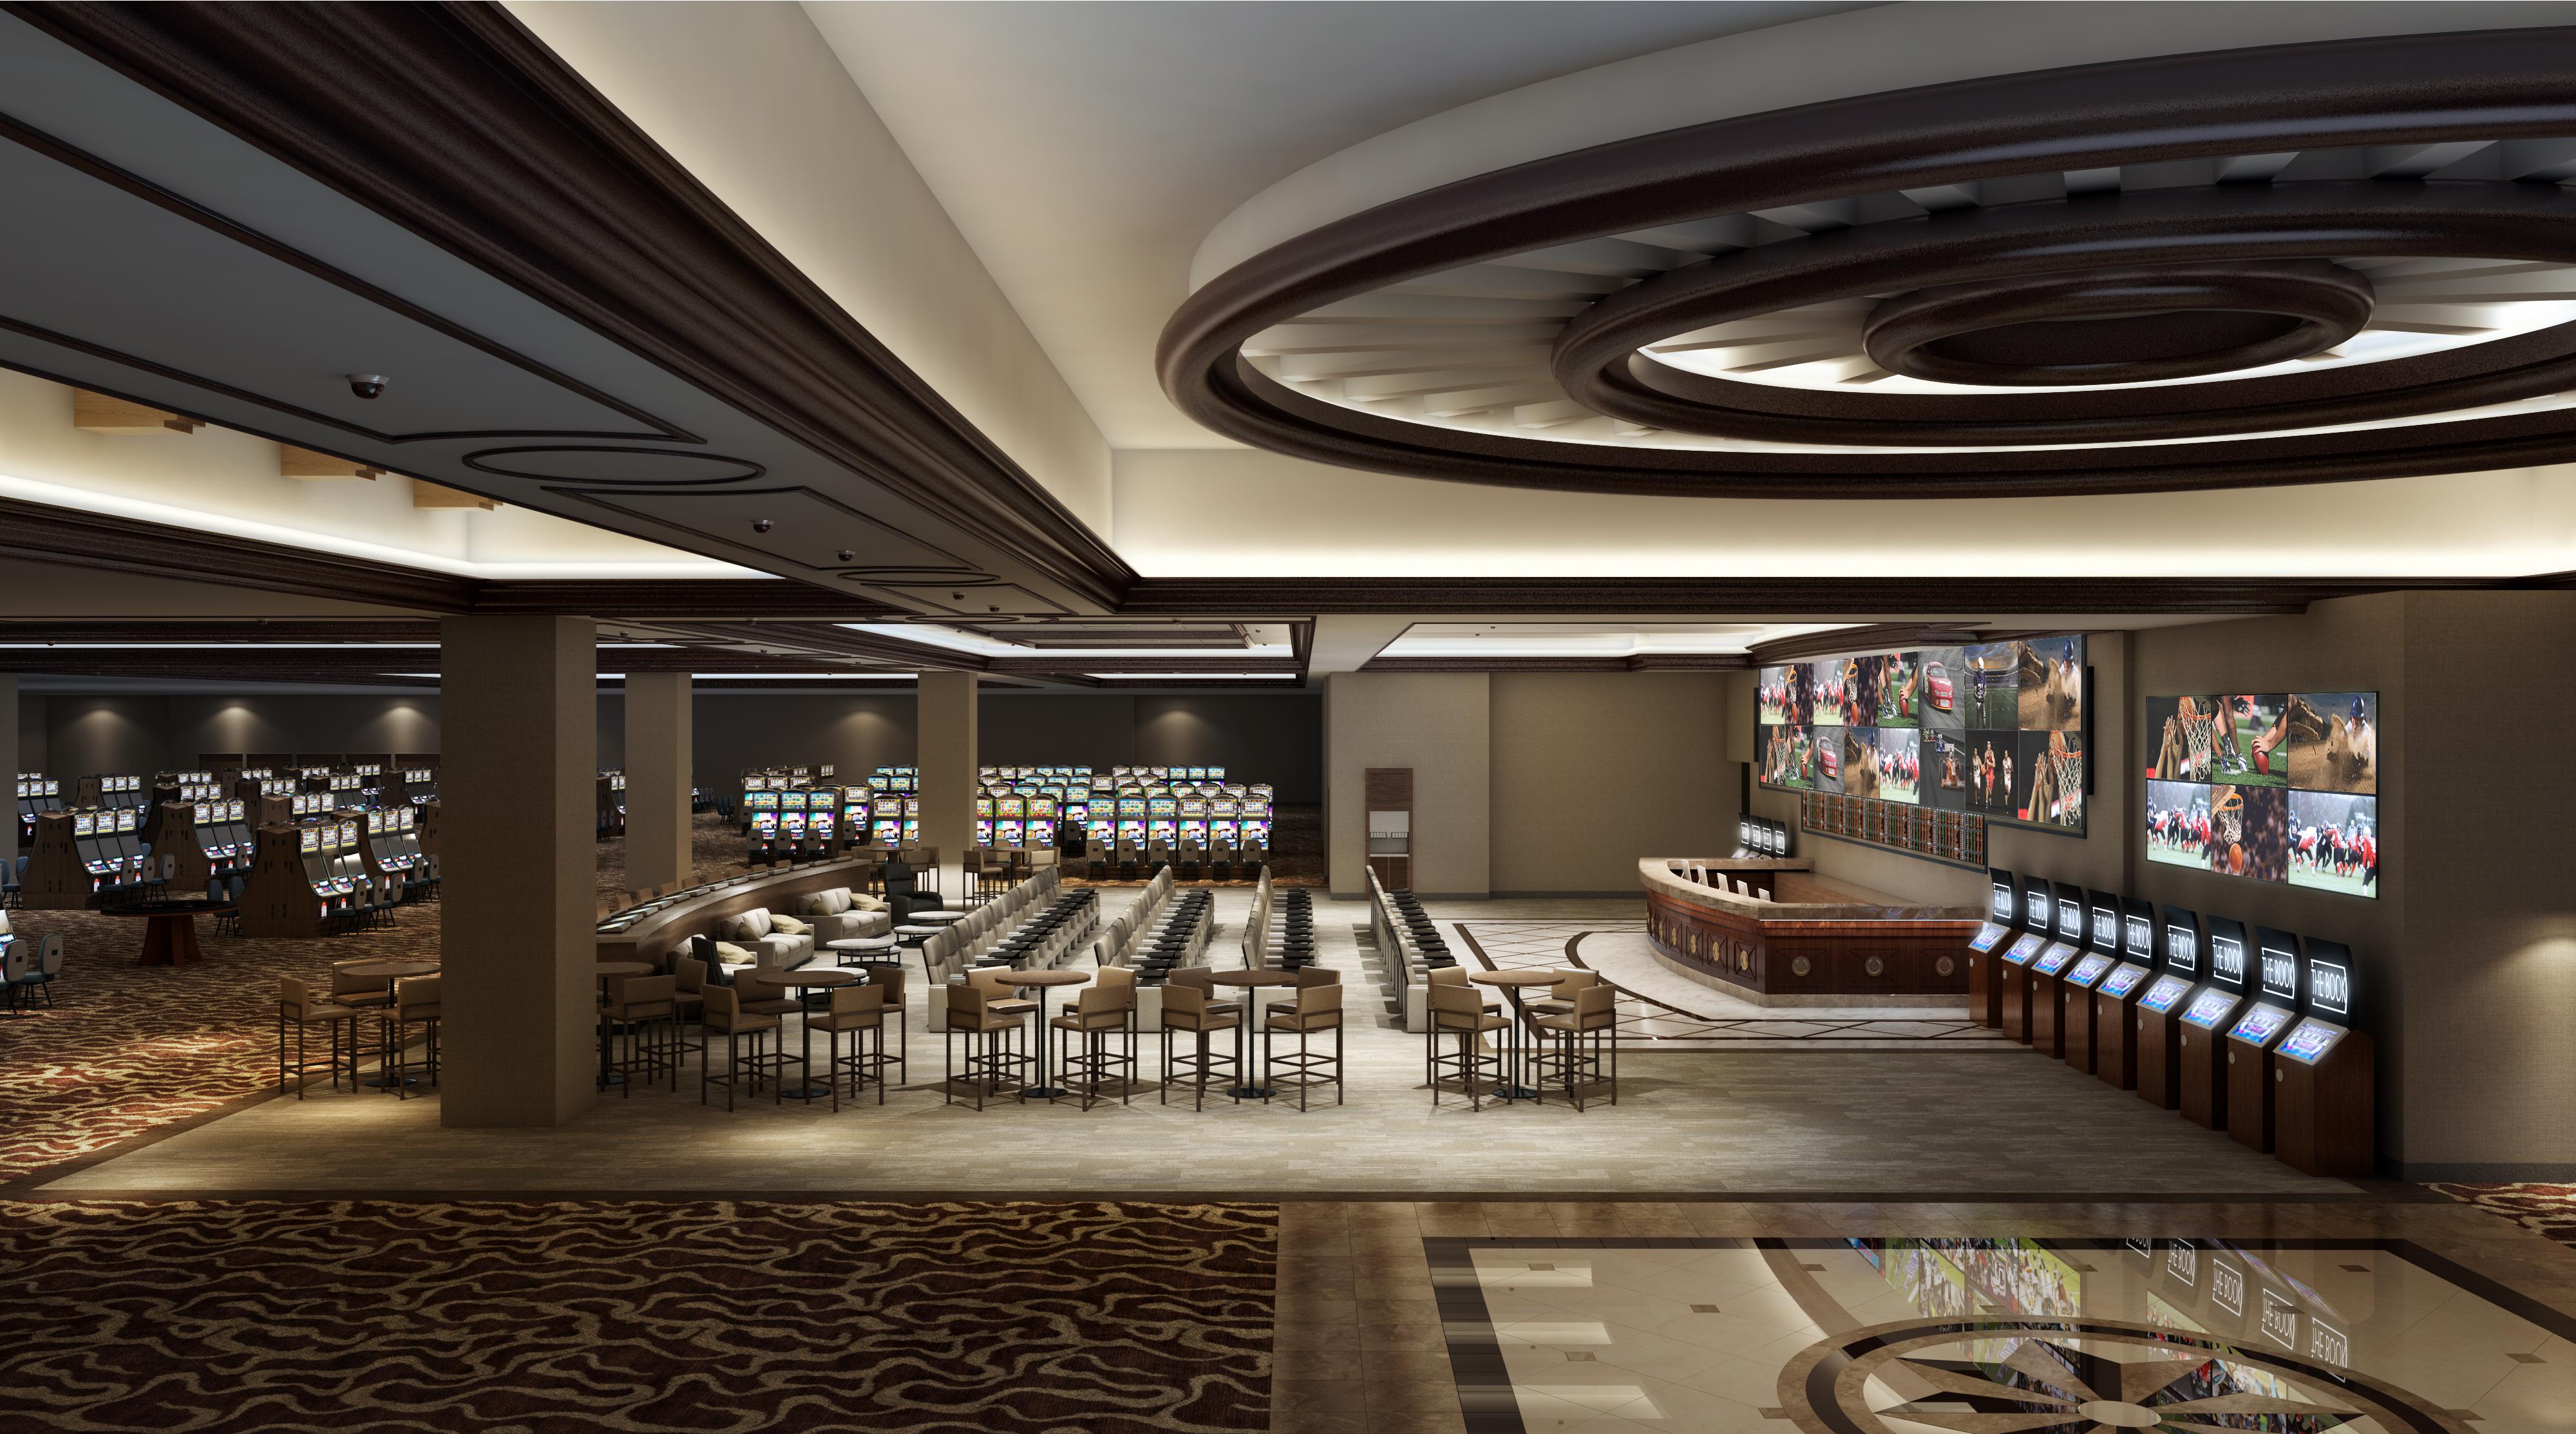 Artist's rendering of Horseshoe Hammond Casino's new sports book, slated to open Sept. 4.